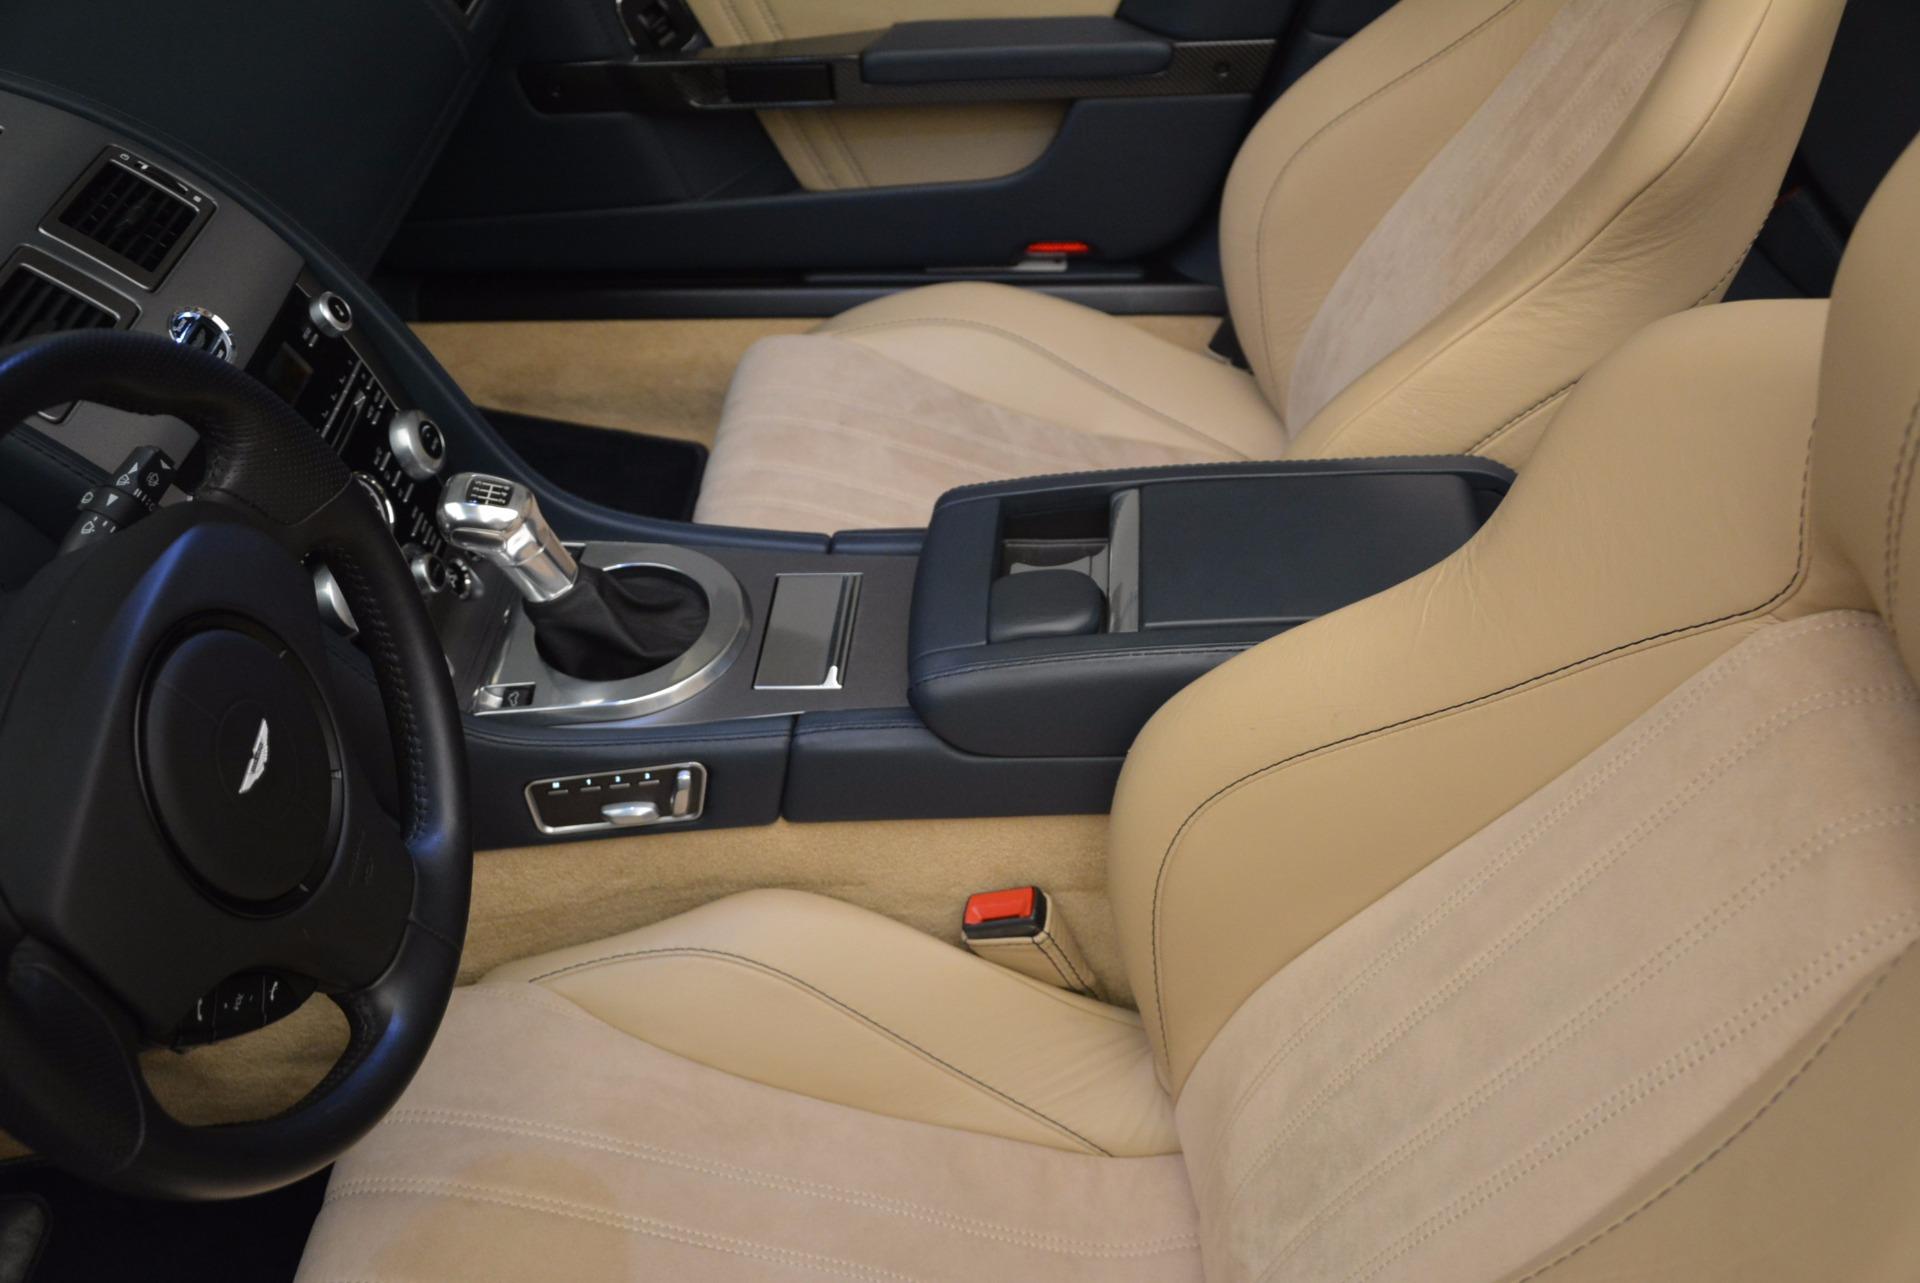 Used 2012 Aston Martin DBS Volante For Sale In Greenwich, CT 644_p26